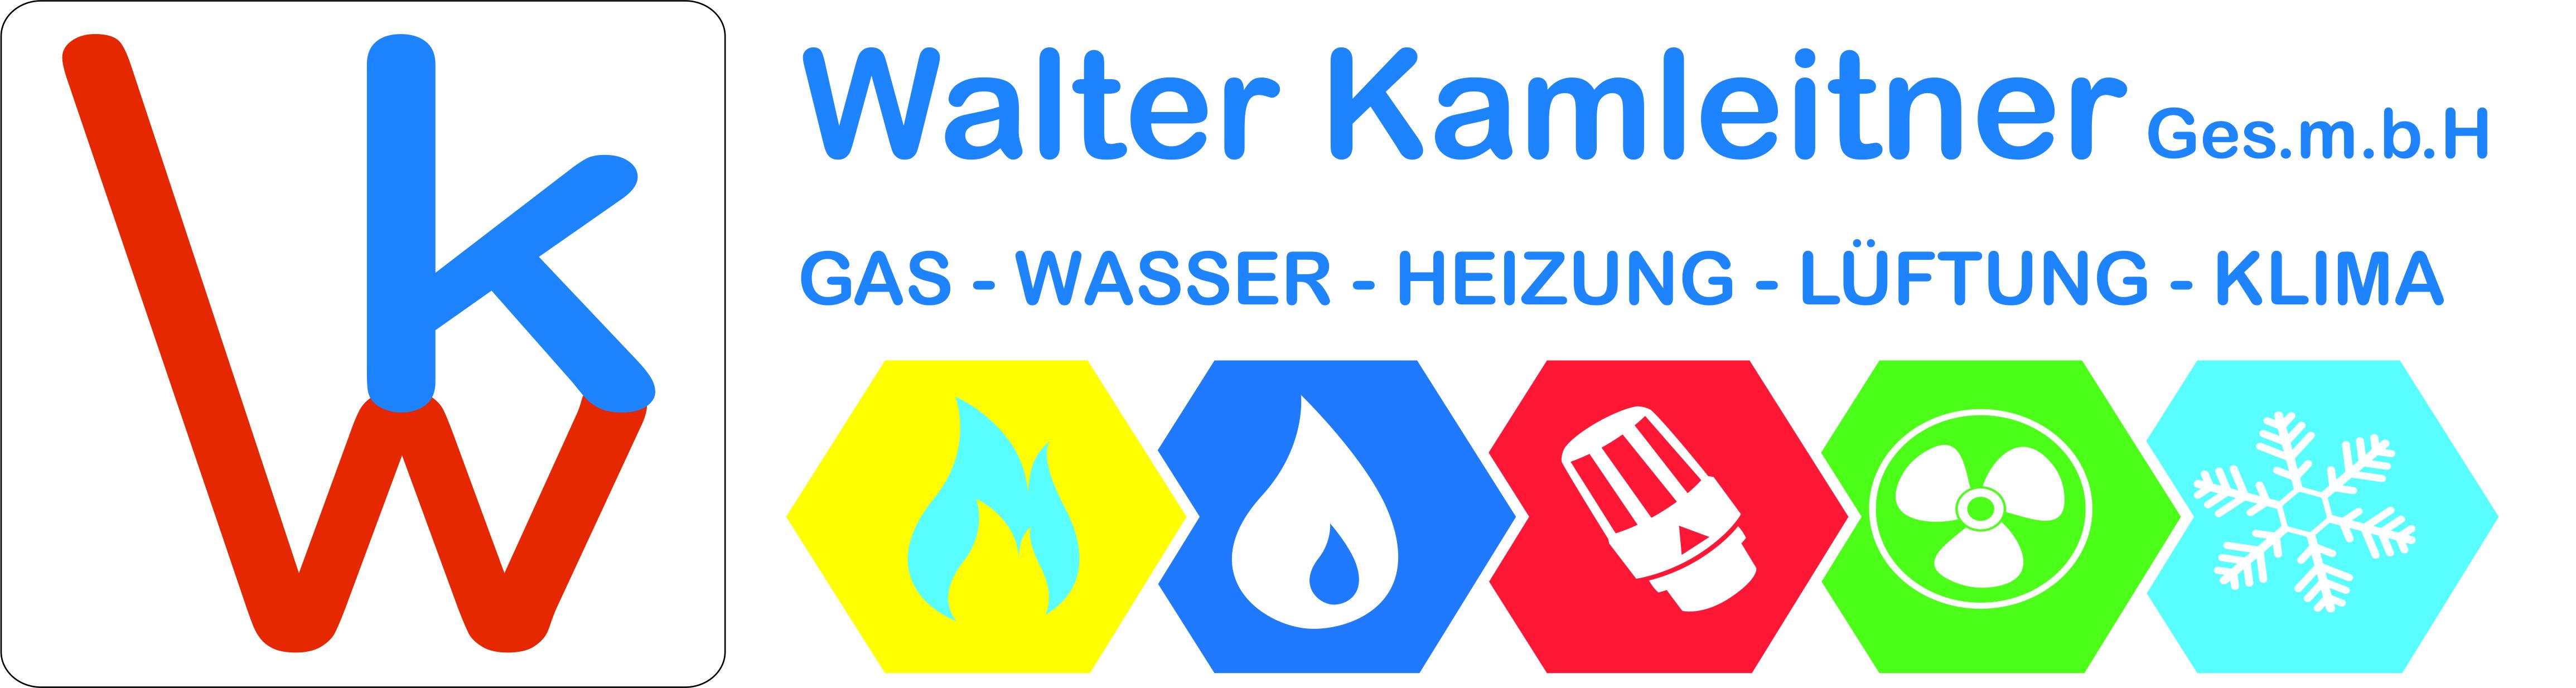 Walter Kamleitner GesmbH Logo